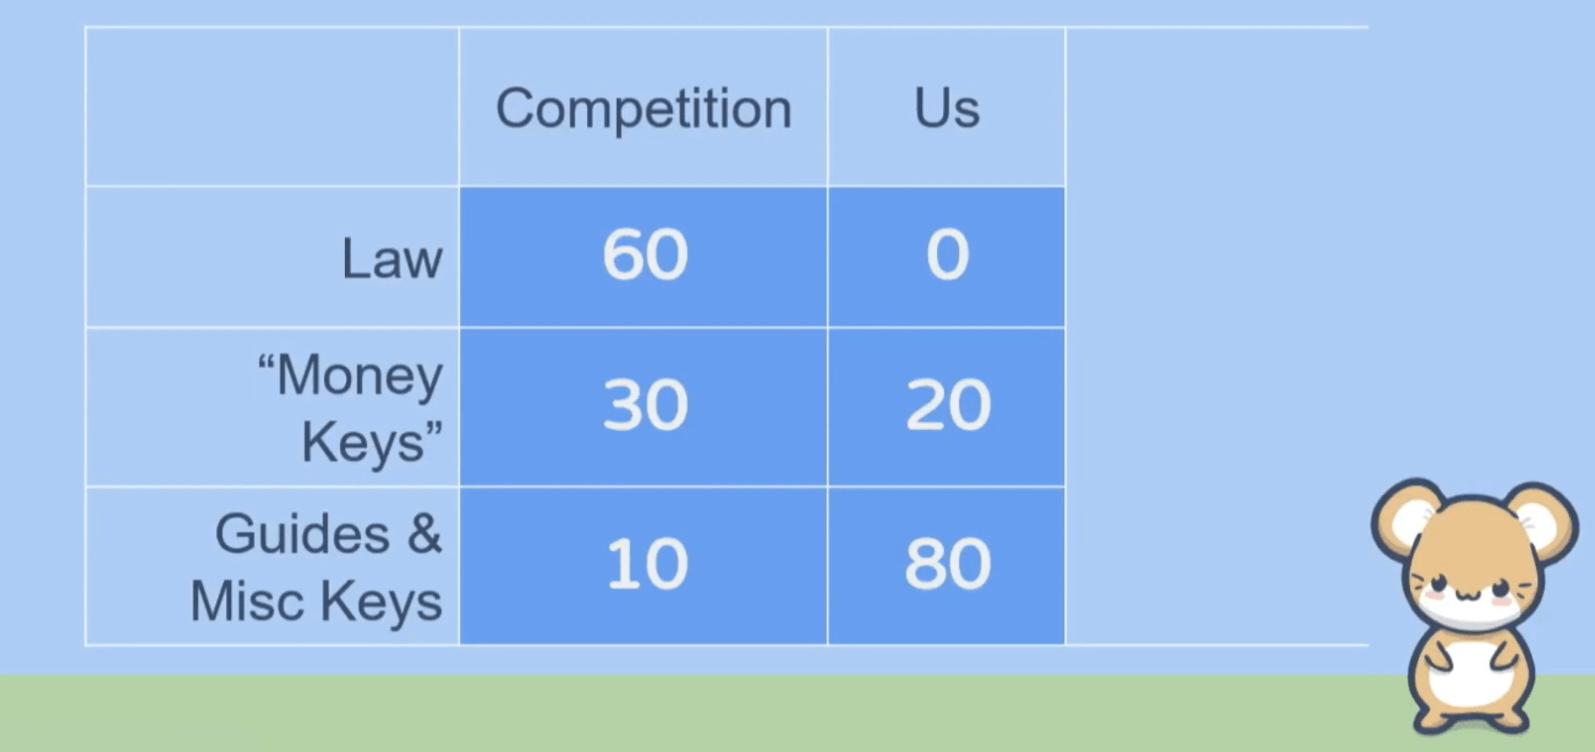 Сравнение контента проекта Mesothelioma с конкурентами